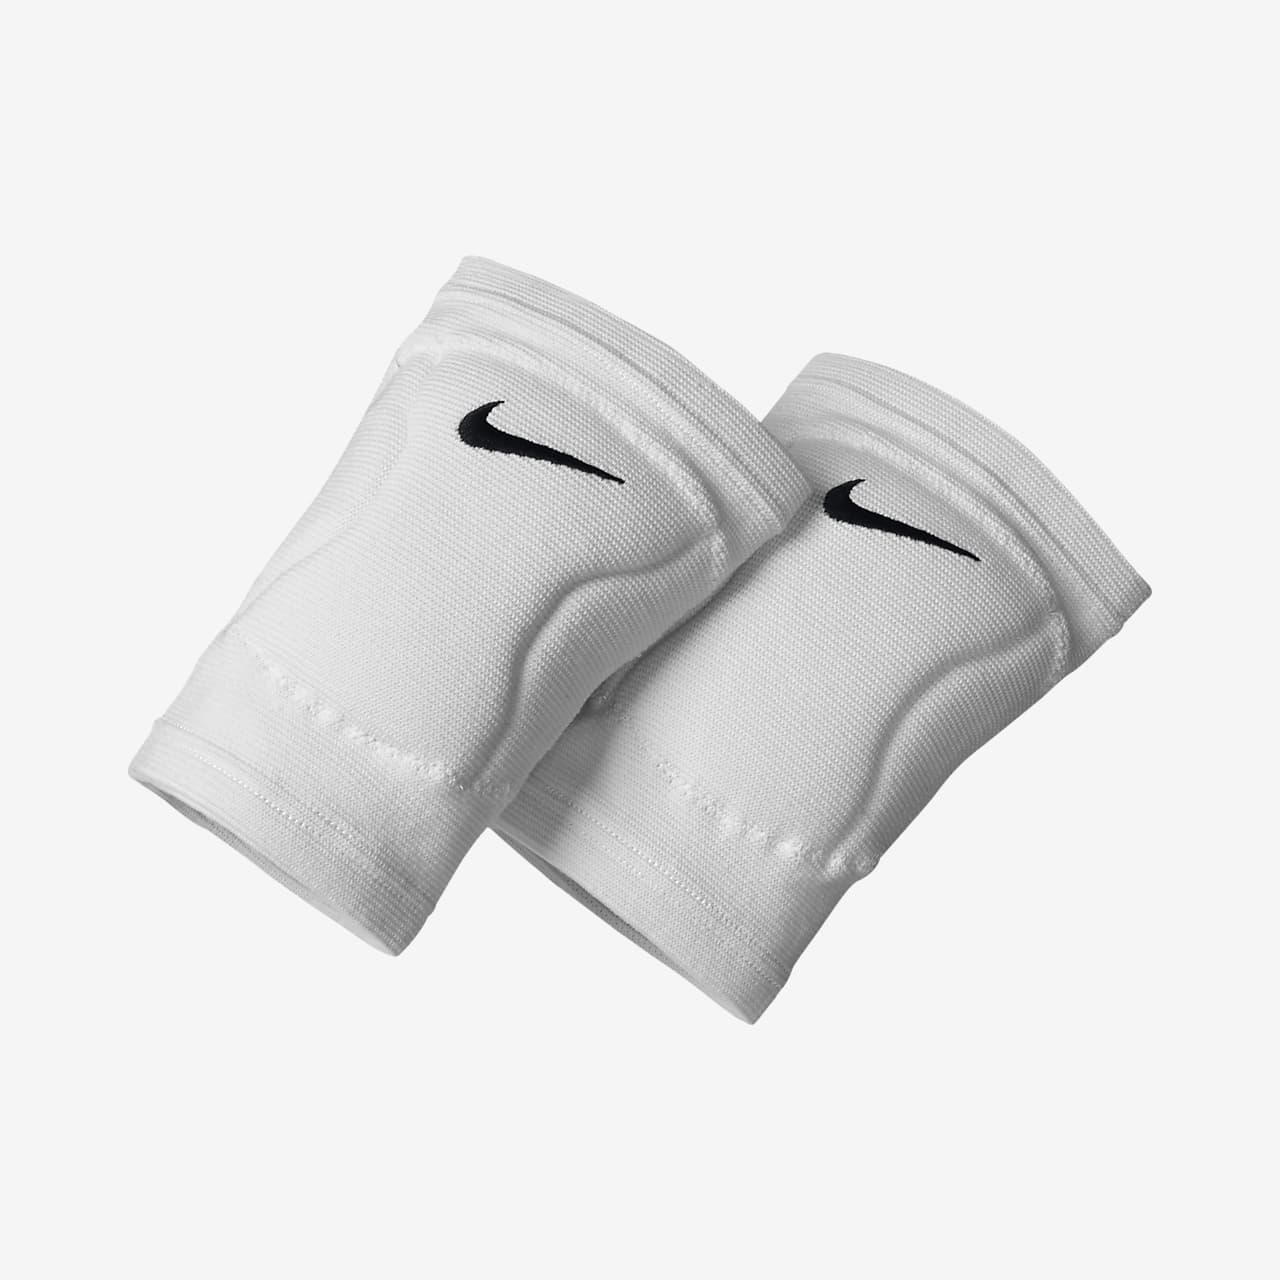 Rodilleras de vóleibol Nike Streak